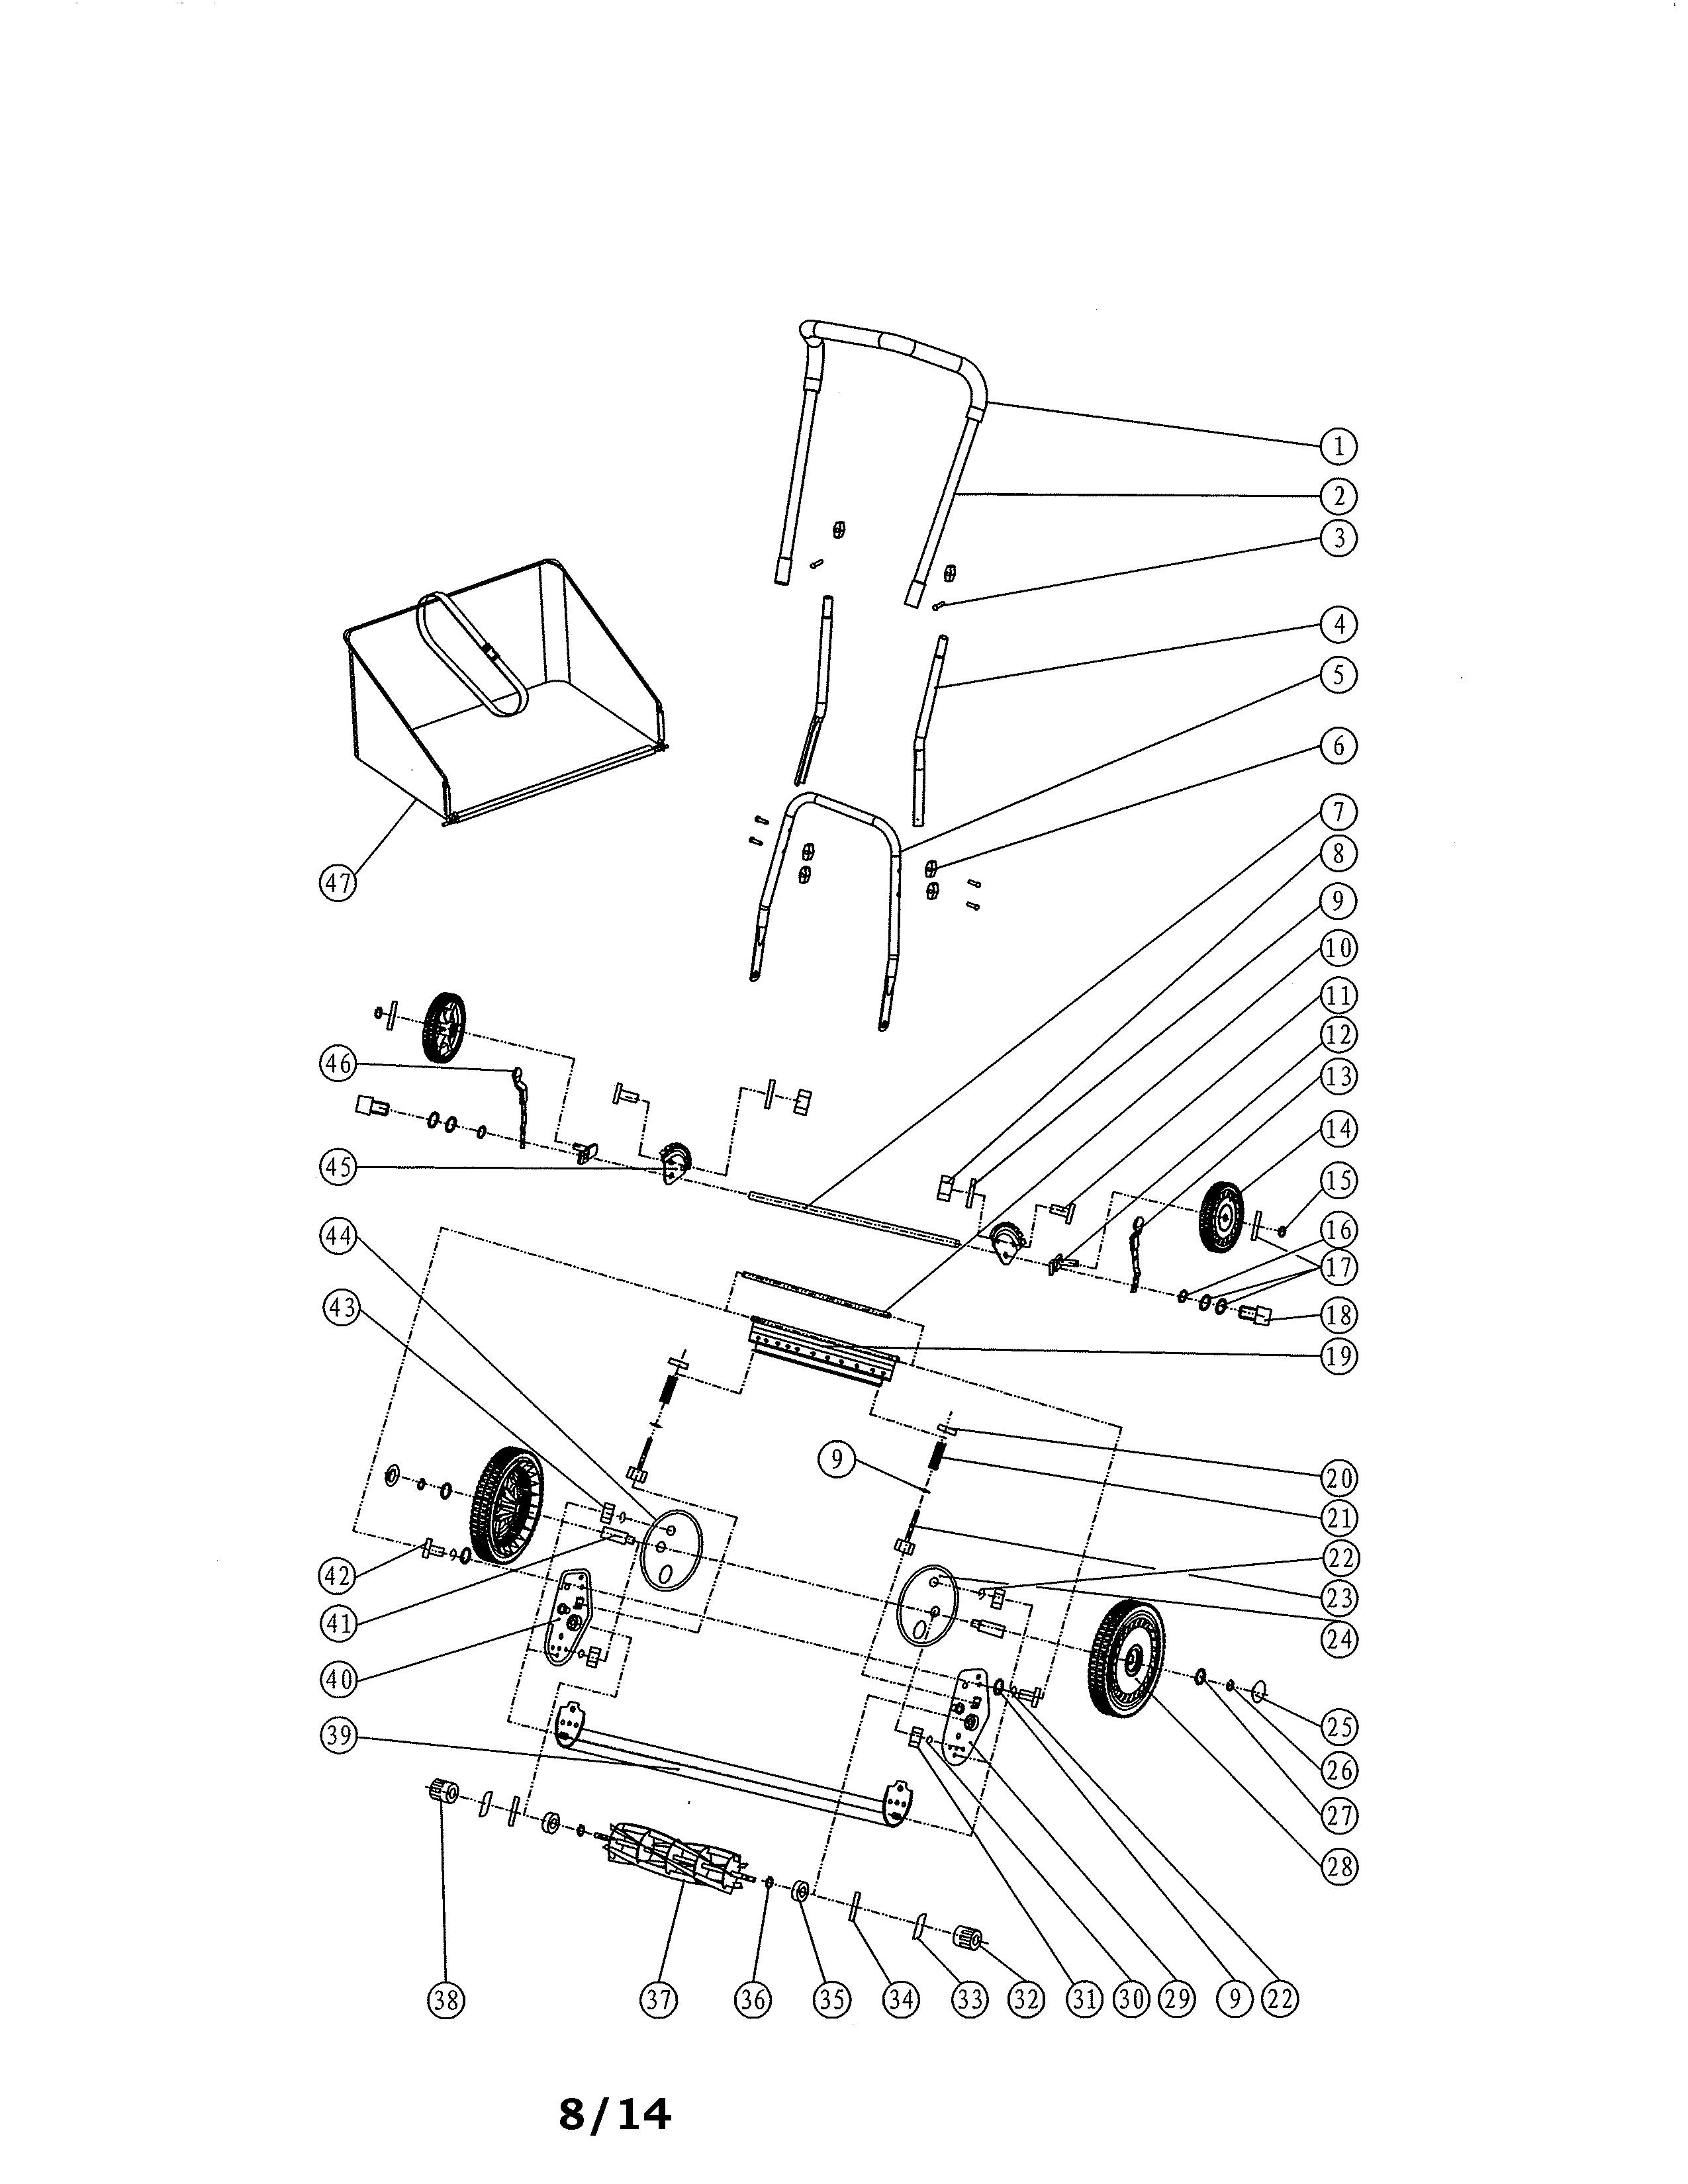 sears lt2000 wiring diagram dual battery boat craftsman lt3000 toyskids co ys4500 31 images carburator